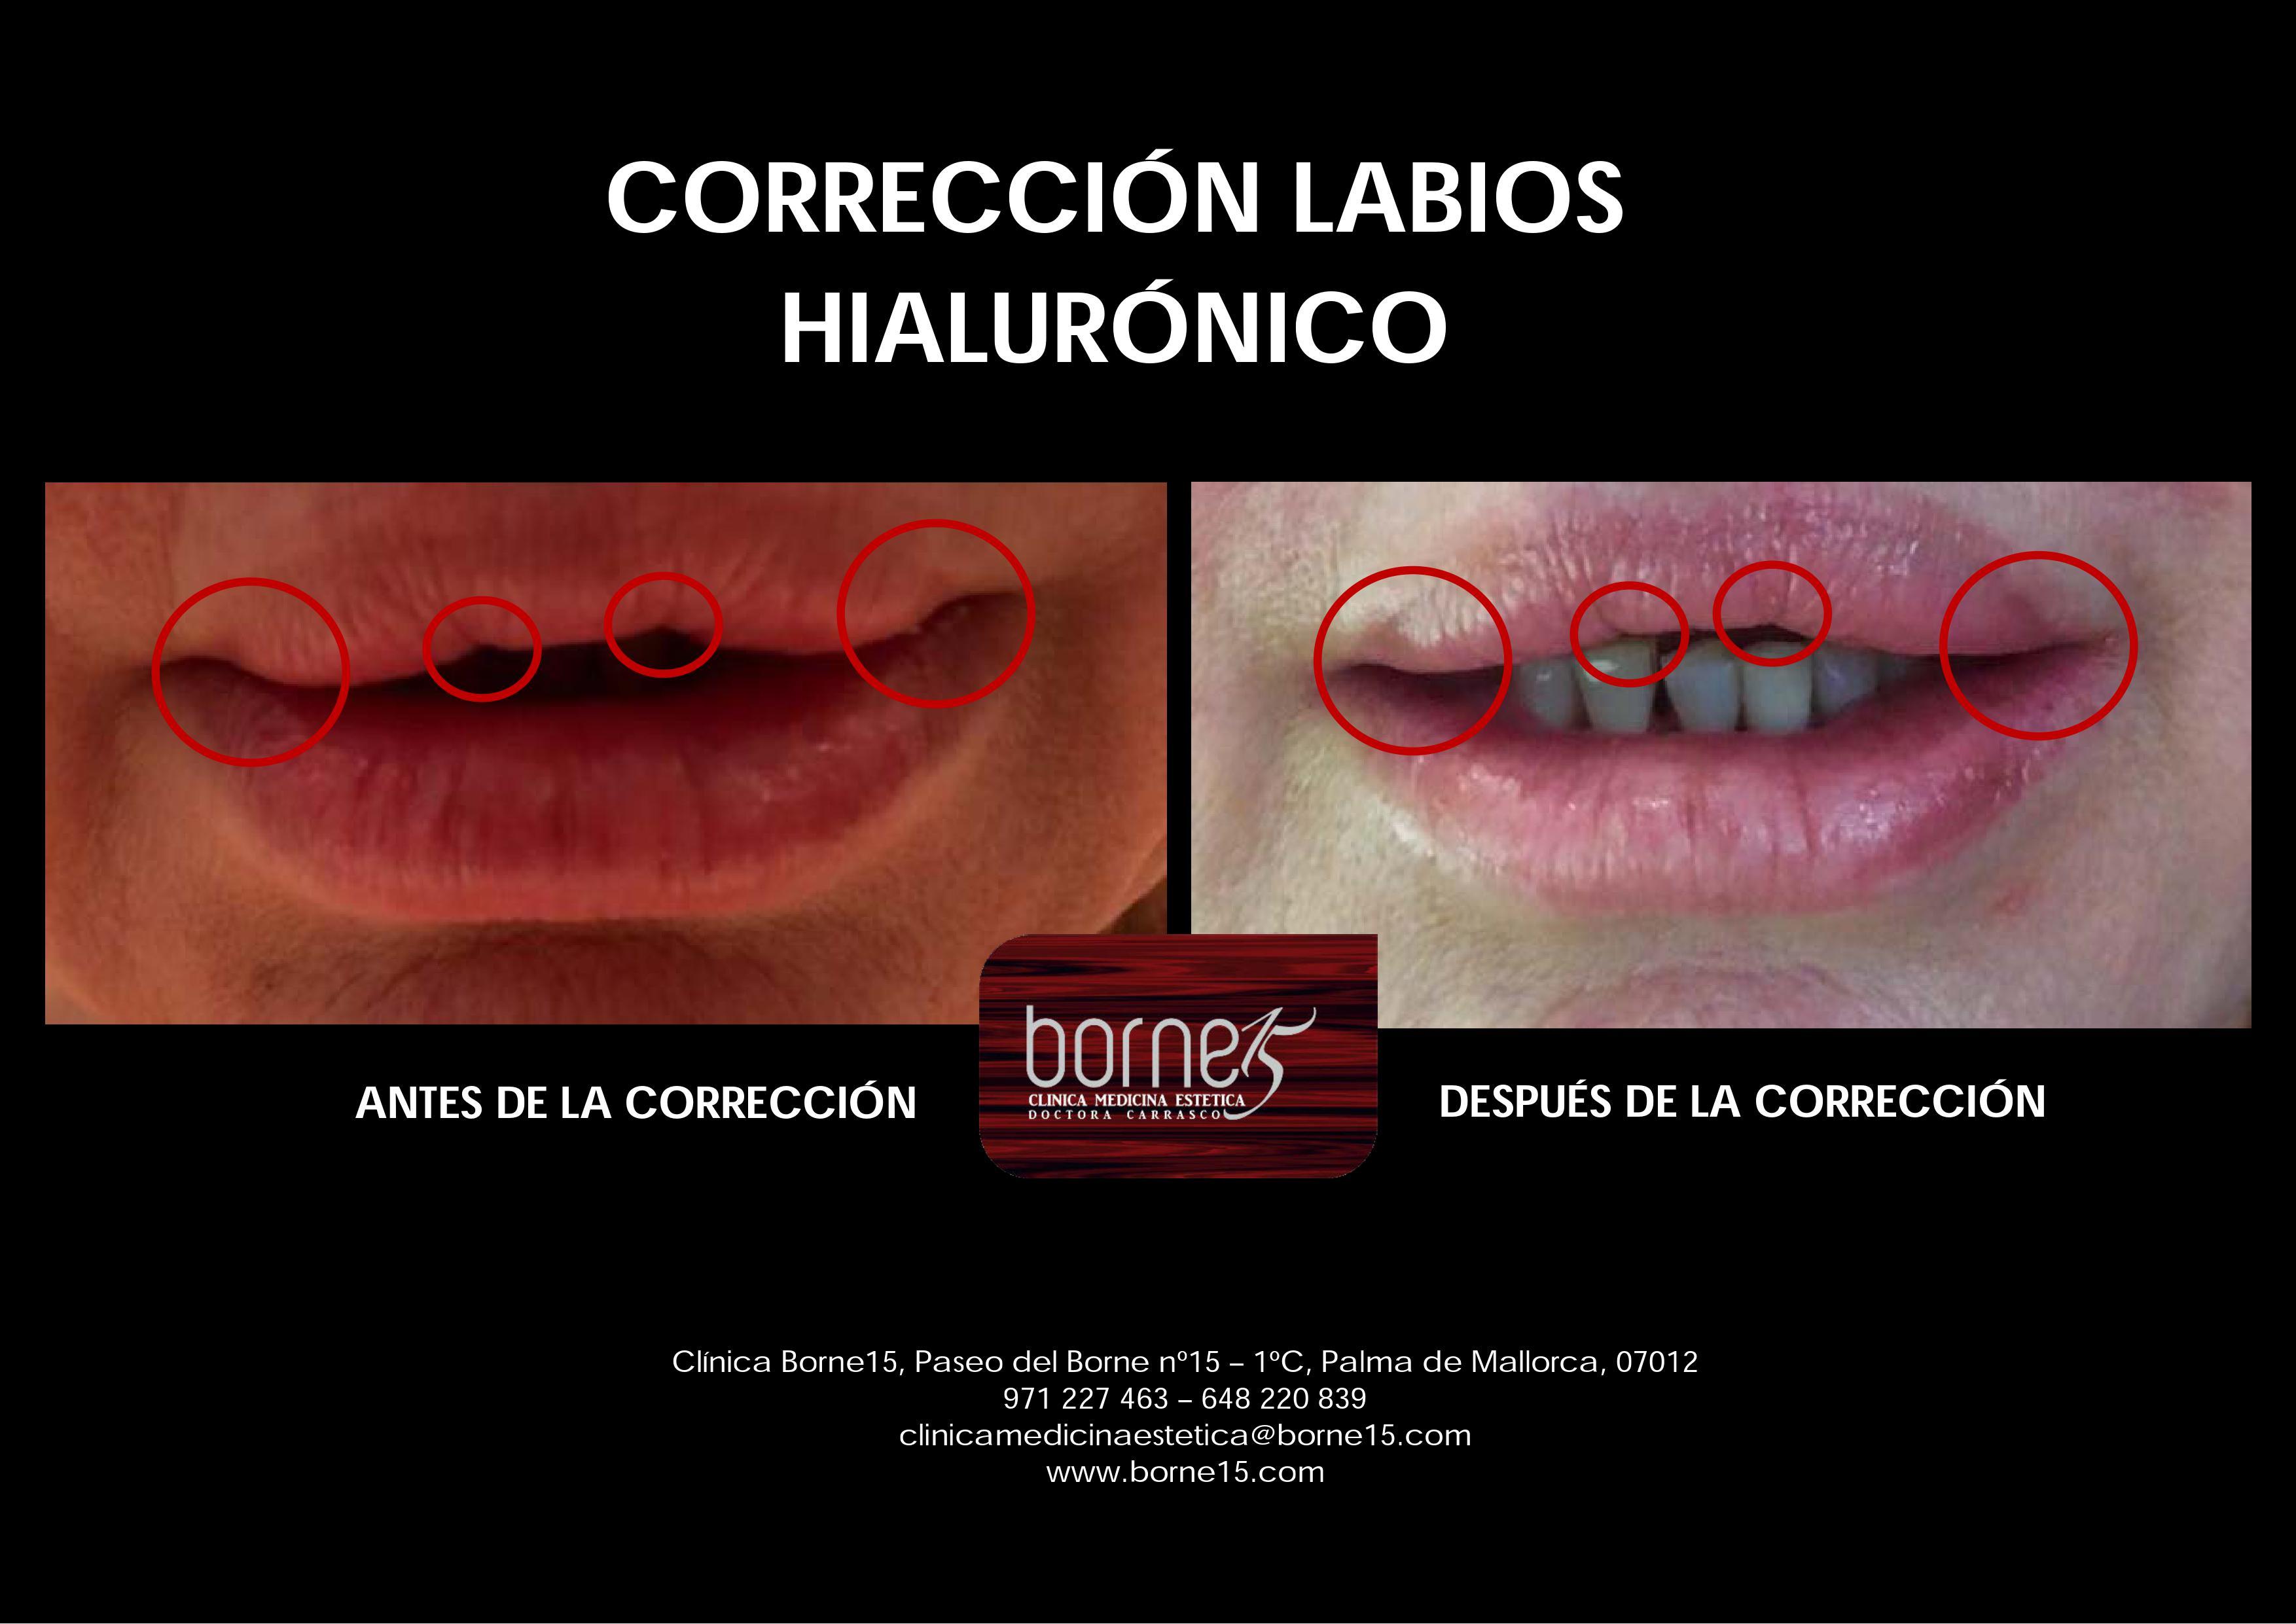 correcion-labios-acido-hialuronico-palma-mallorca-clinica-medicina-estetica-borne-15